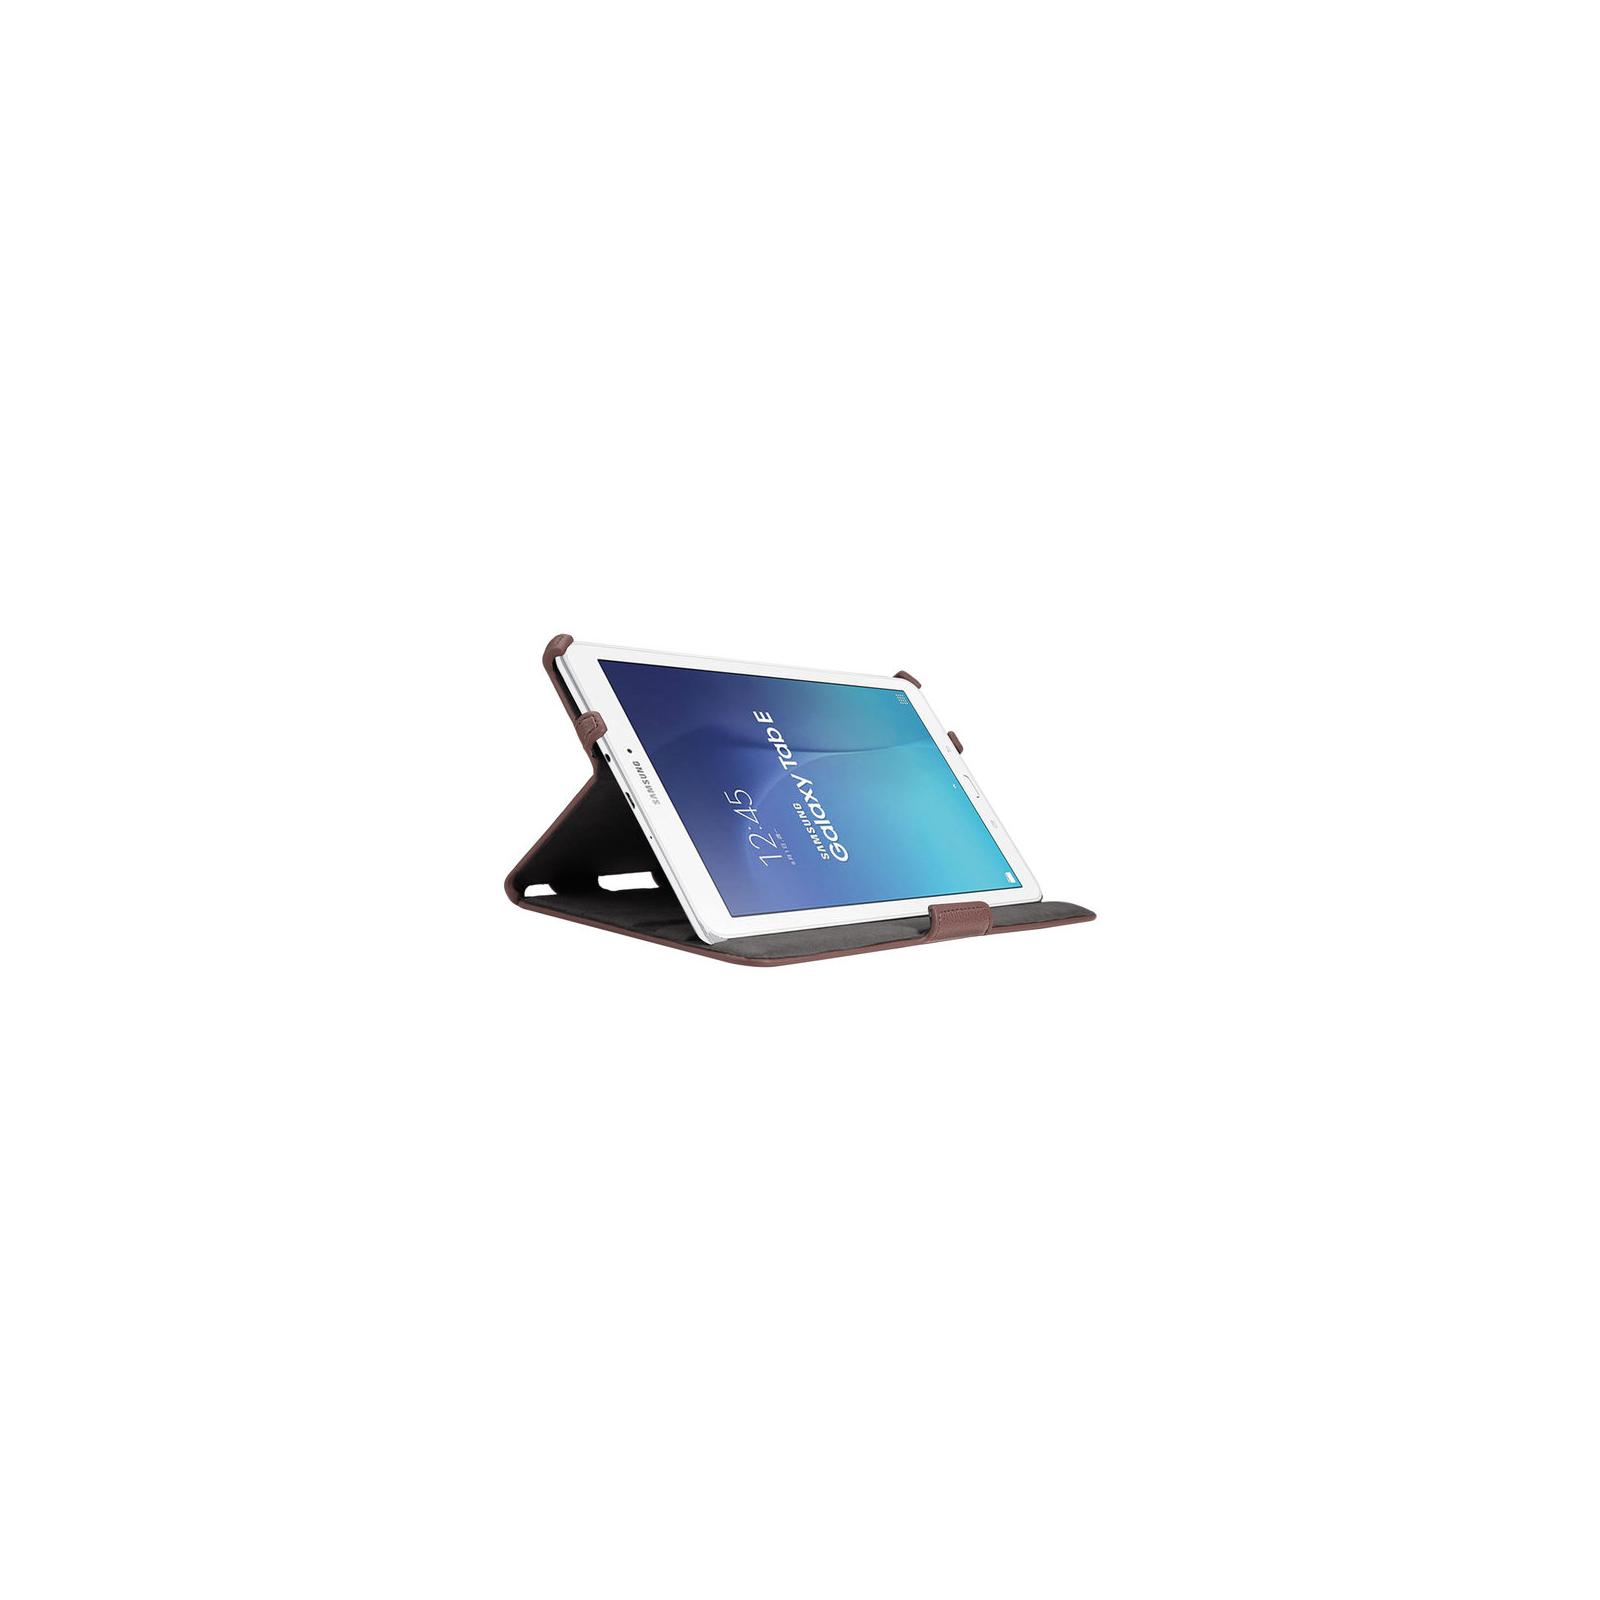 Чехол для планшета AirOn для Samsung Galaxy Tab E 9.6 brown (4822352777128) изображение 6